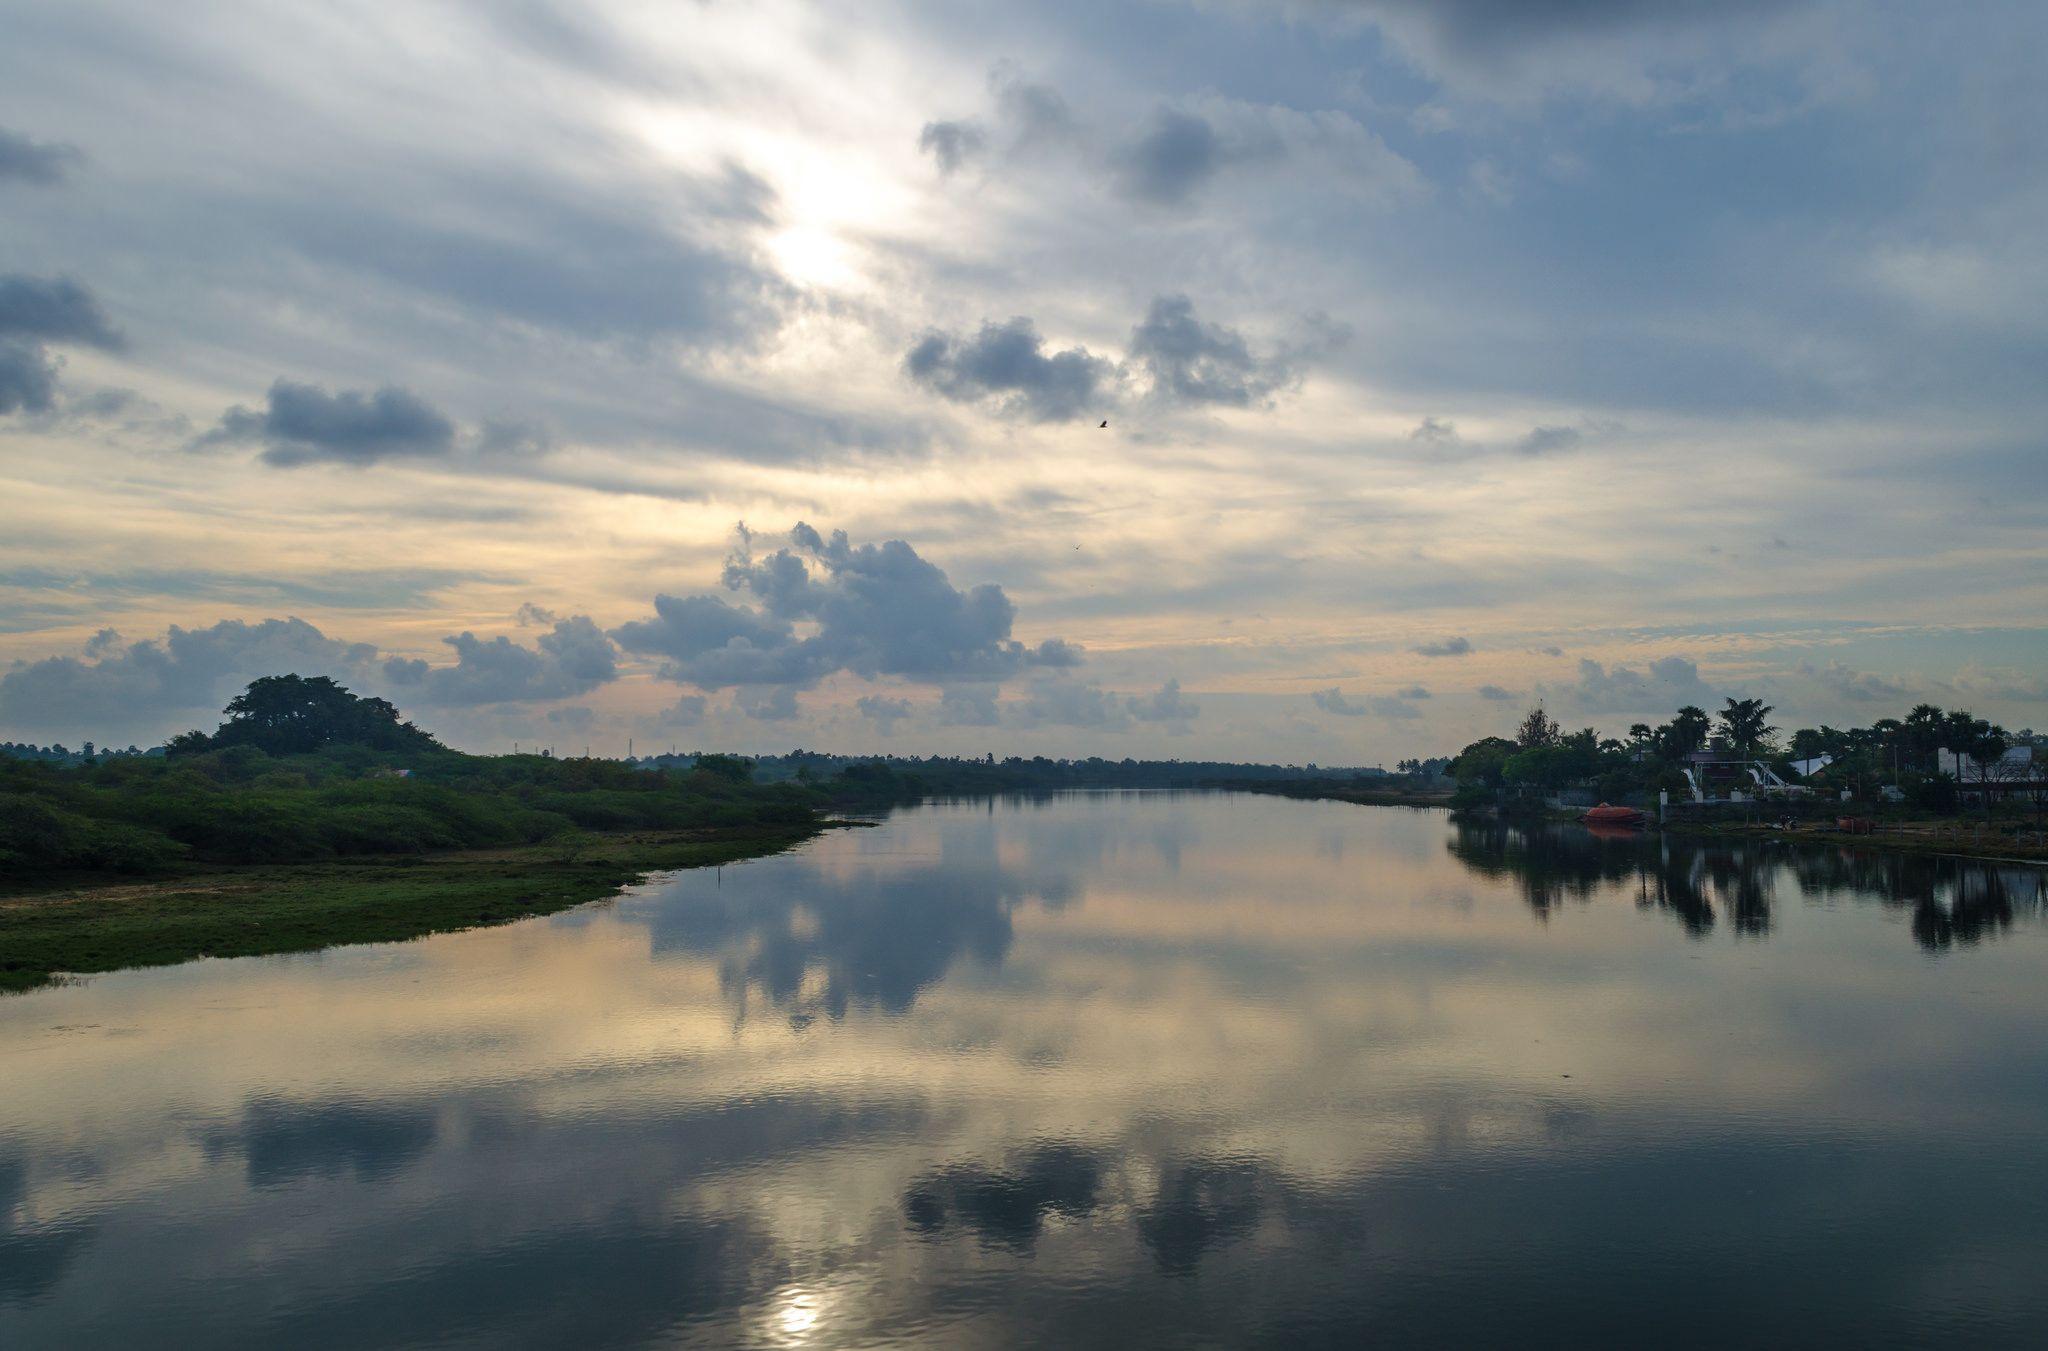 https://flic.kr/p/DH9MVj | Waterscapes | Waterscapes at Marakanam , Tamilnadu, India